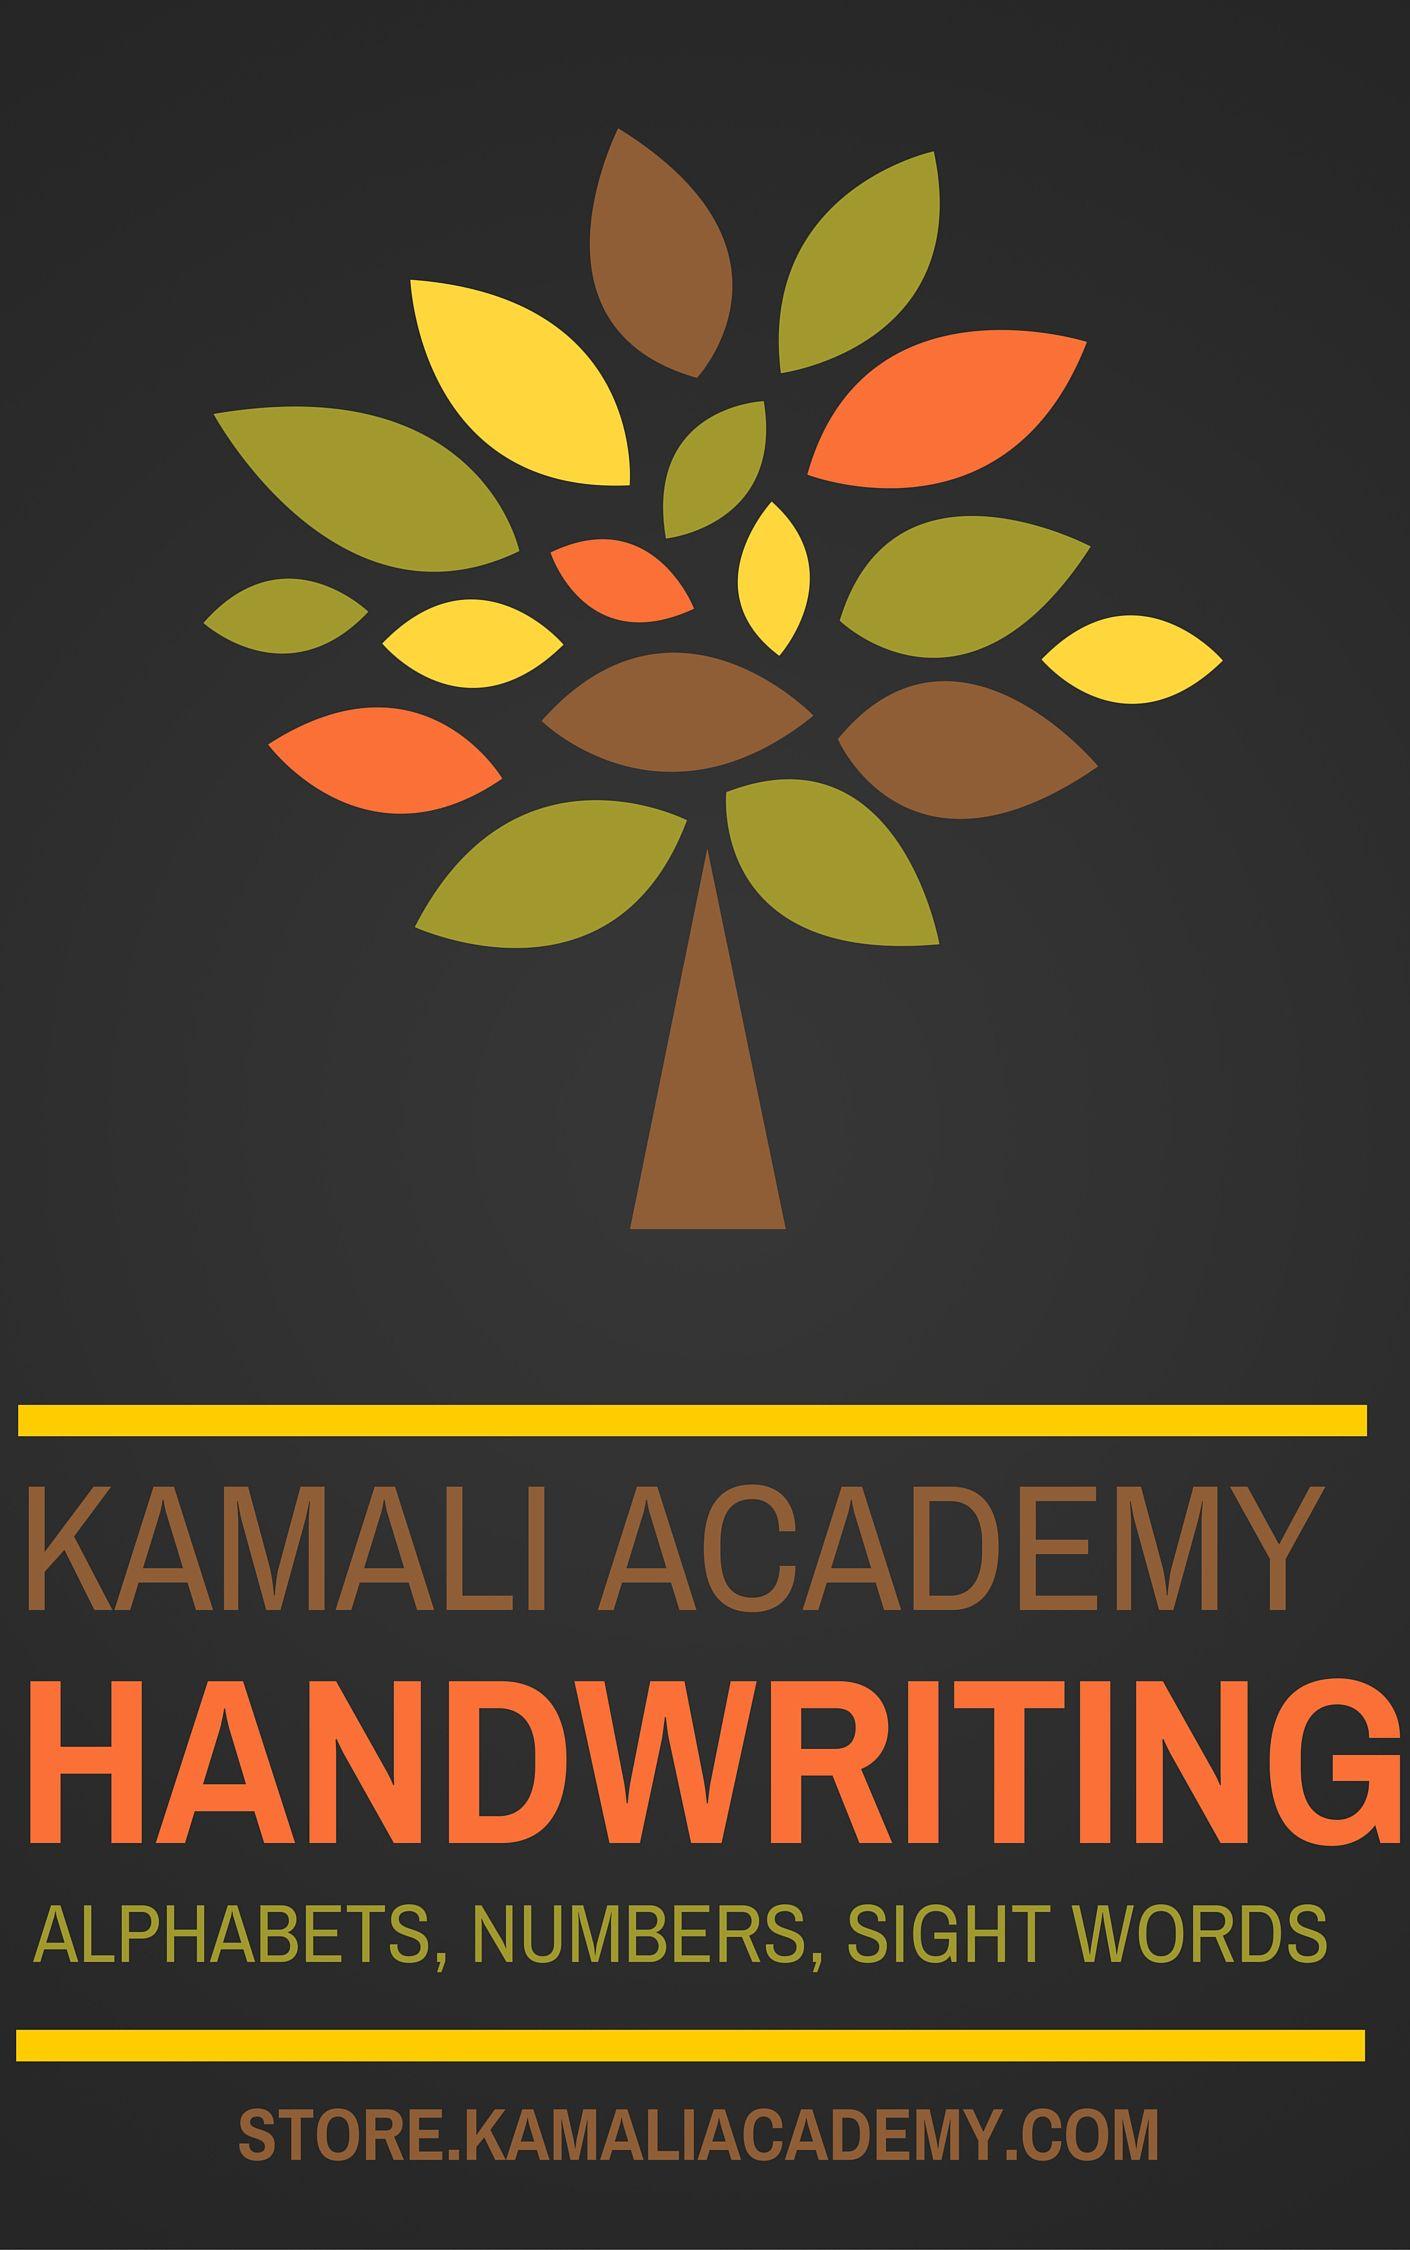 Kamali Academy Handwriting